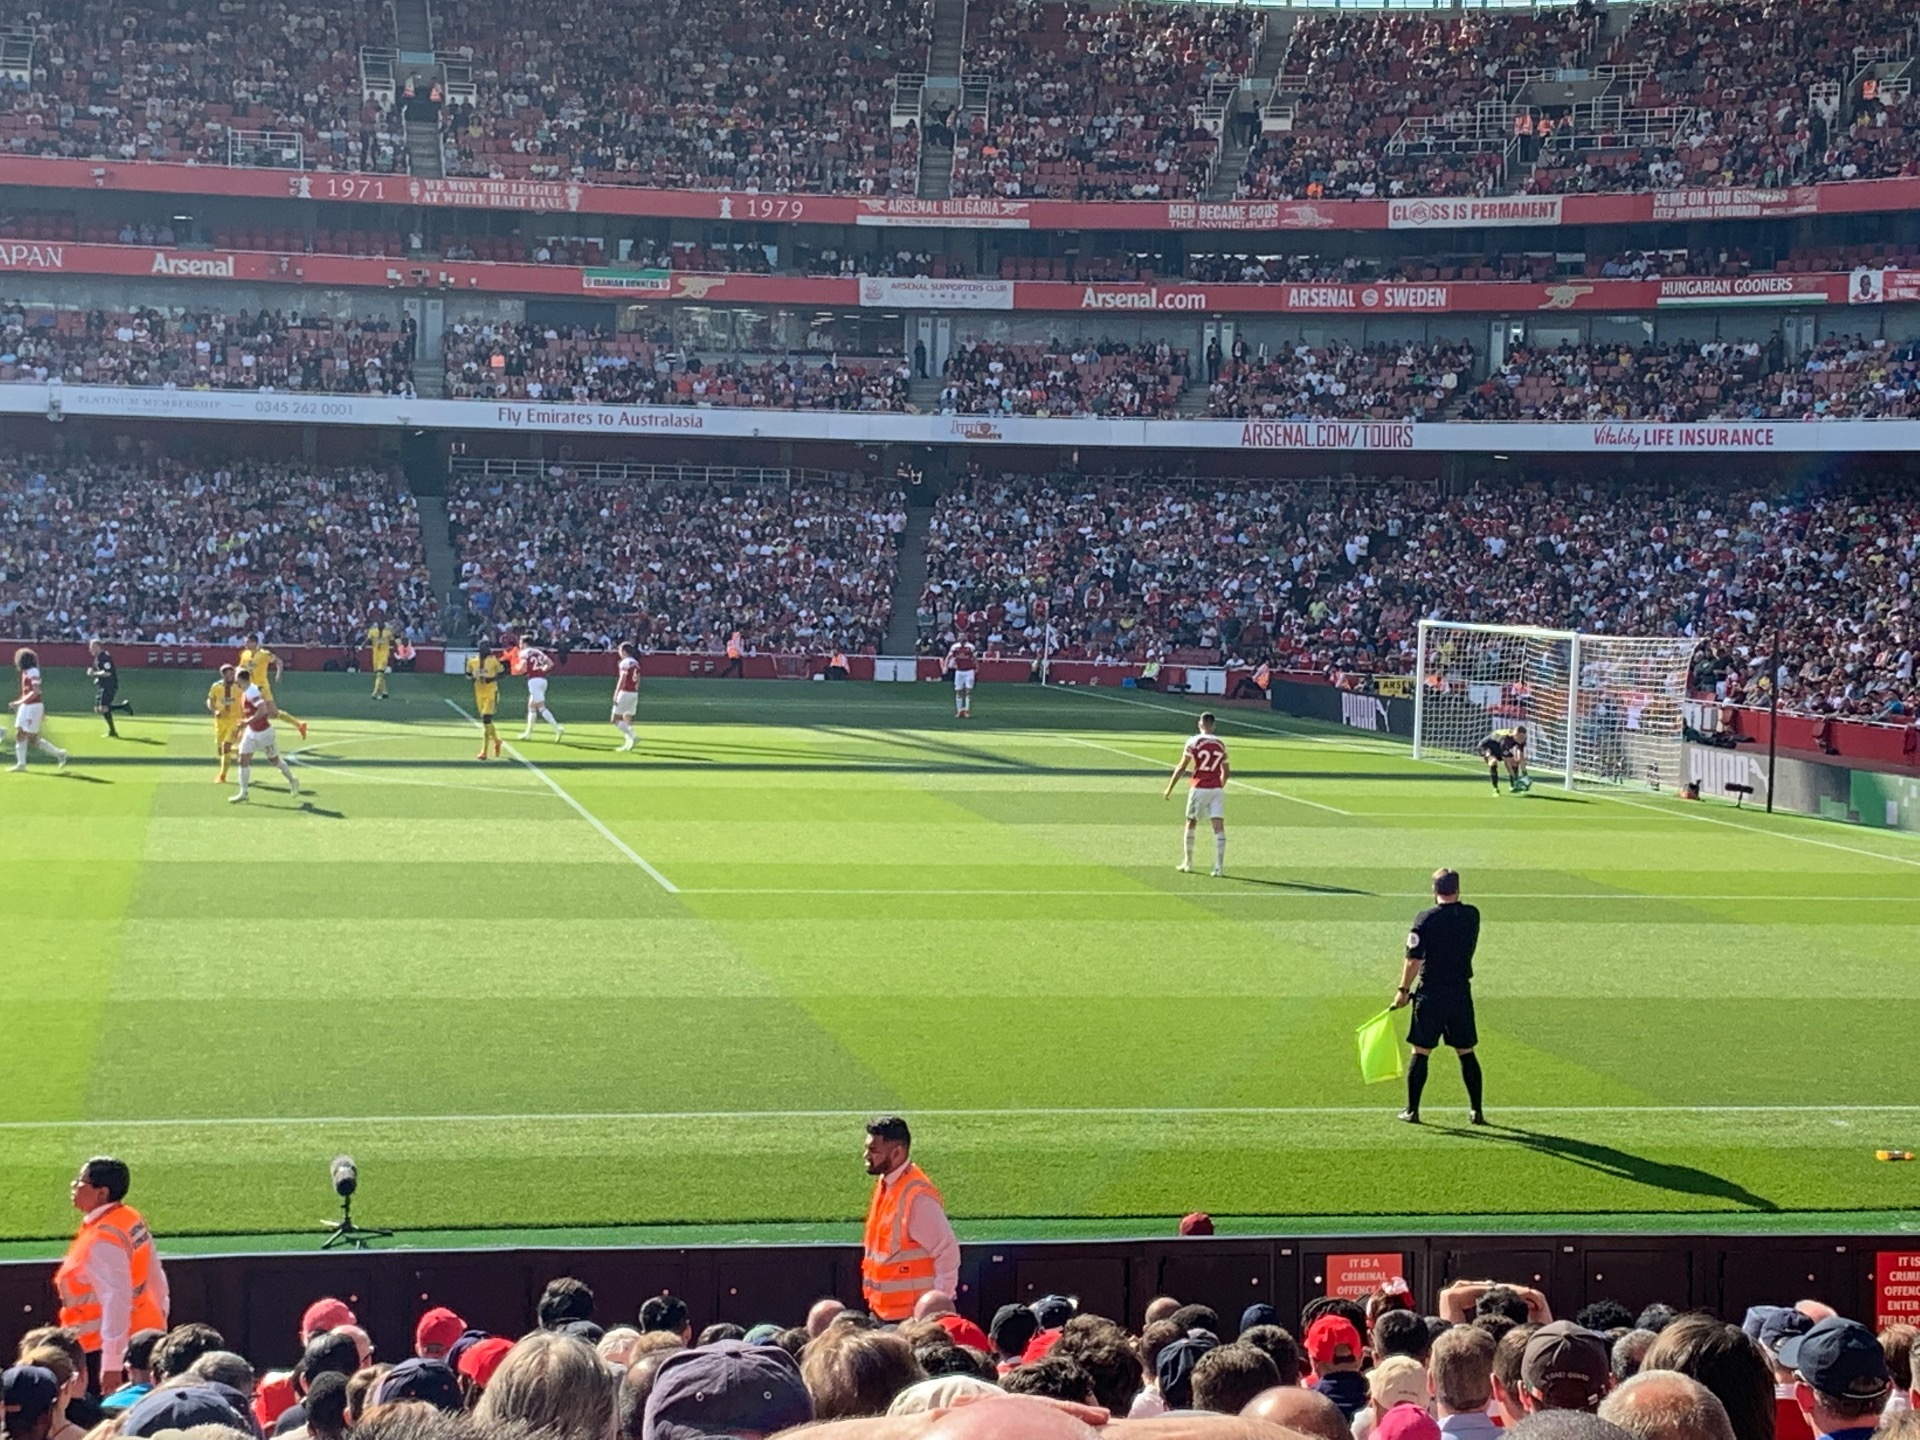 Emirates Stadium Section 16 Row 27 Seat 499